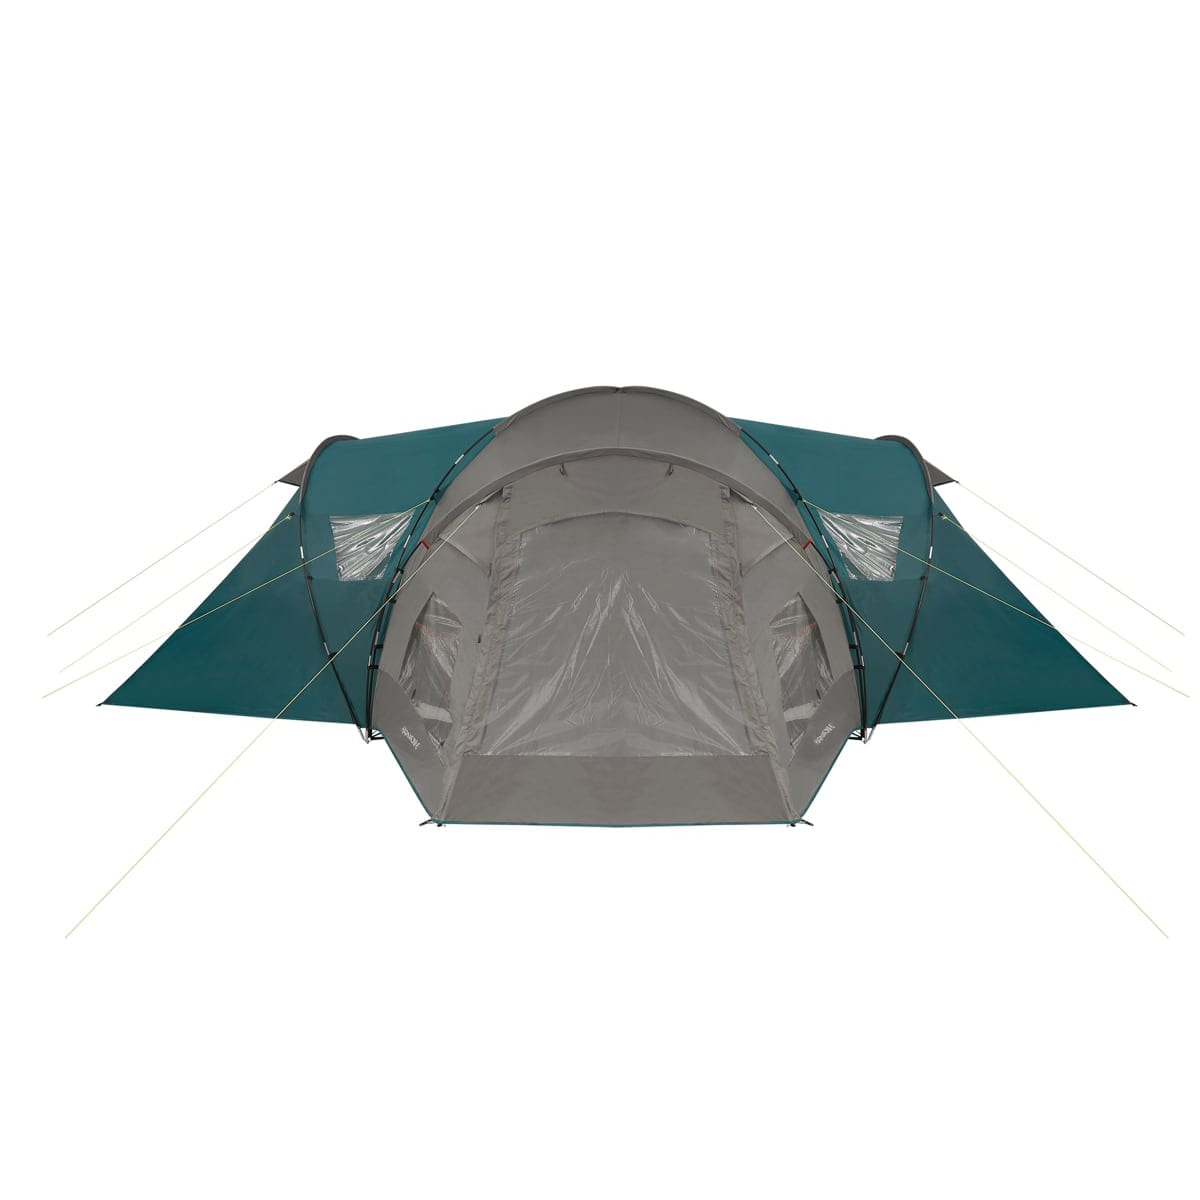 Kjøp Sydvang Harmoni Camping Tent 4P fra Outnorth